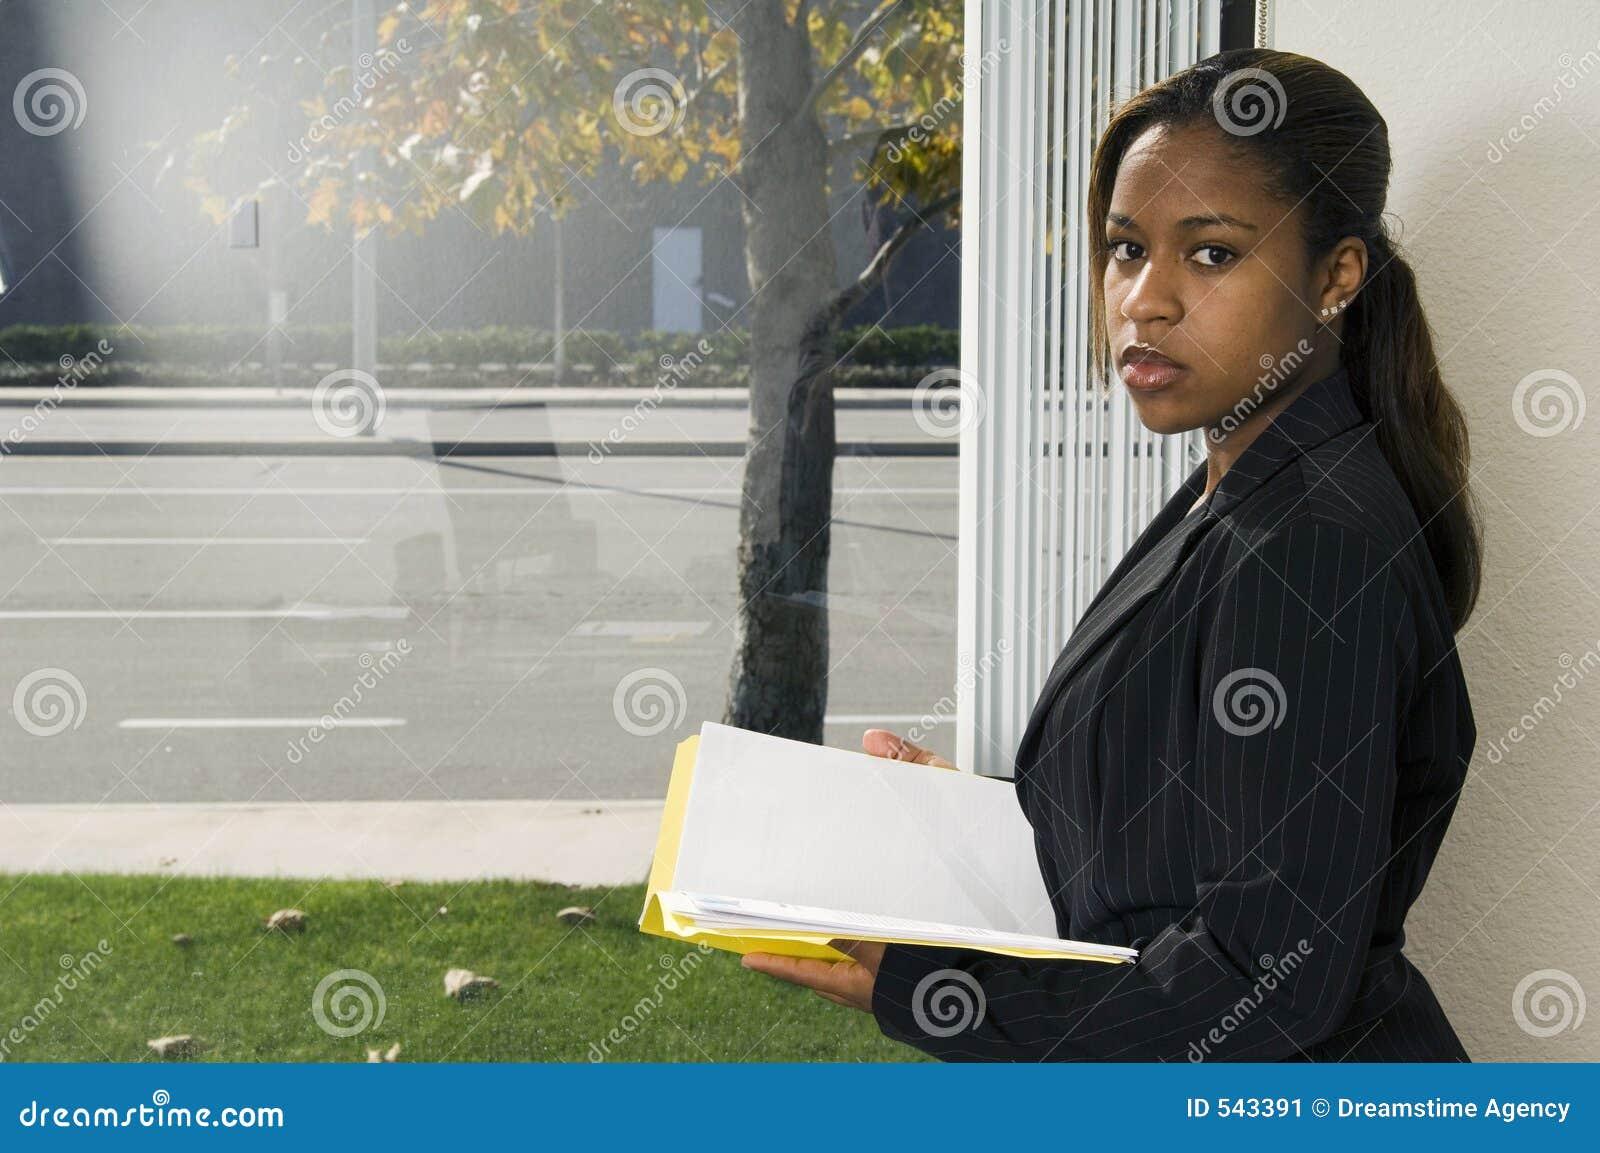 Download 读取视窗 库存图片. 图片 包括有 妇女, 信息, 清醒, 公文包, 商业, 总公司, 读取, 严重, 视窗 - 543391